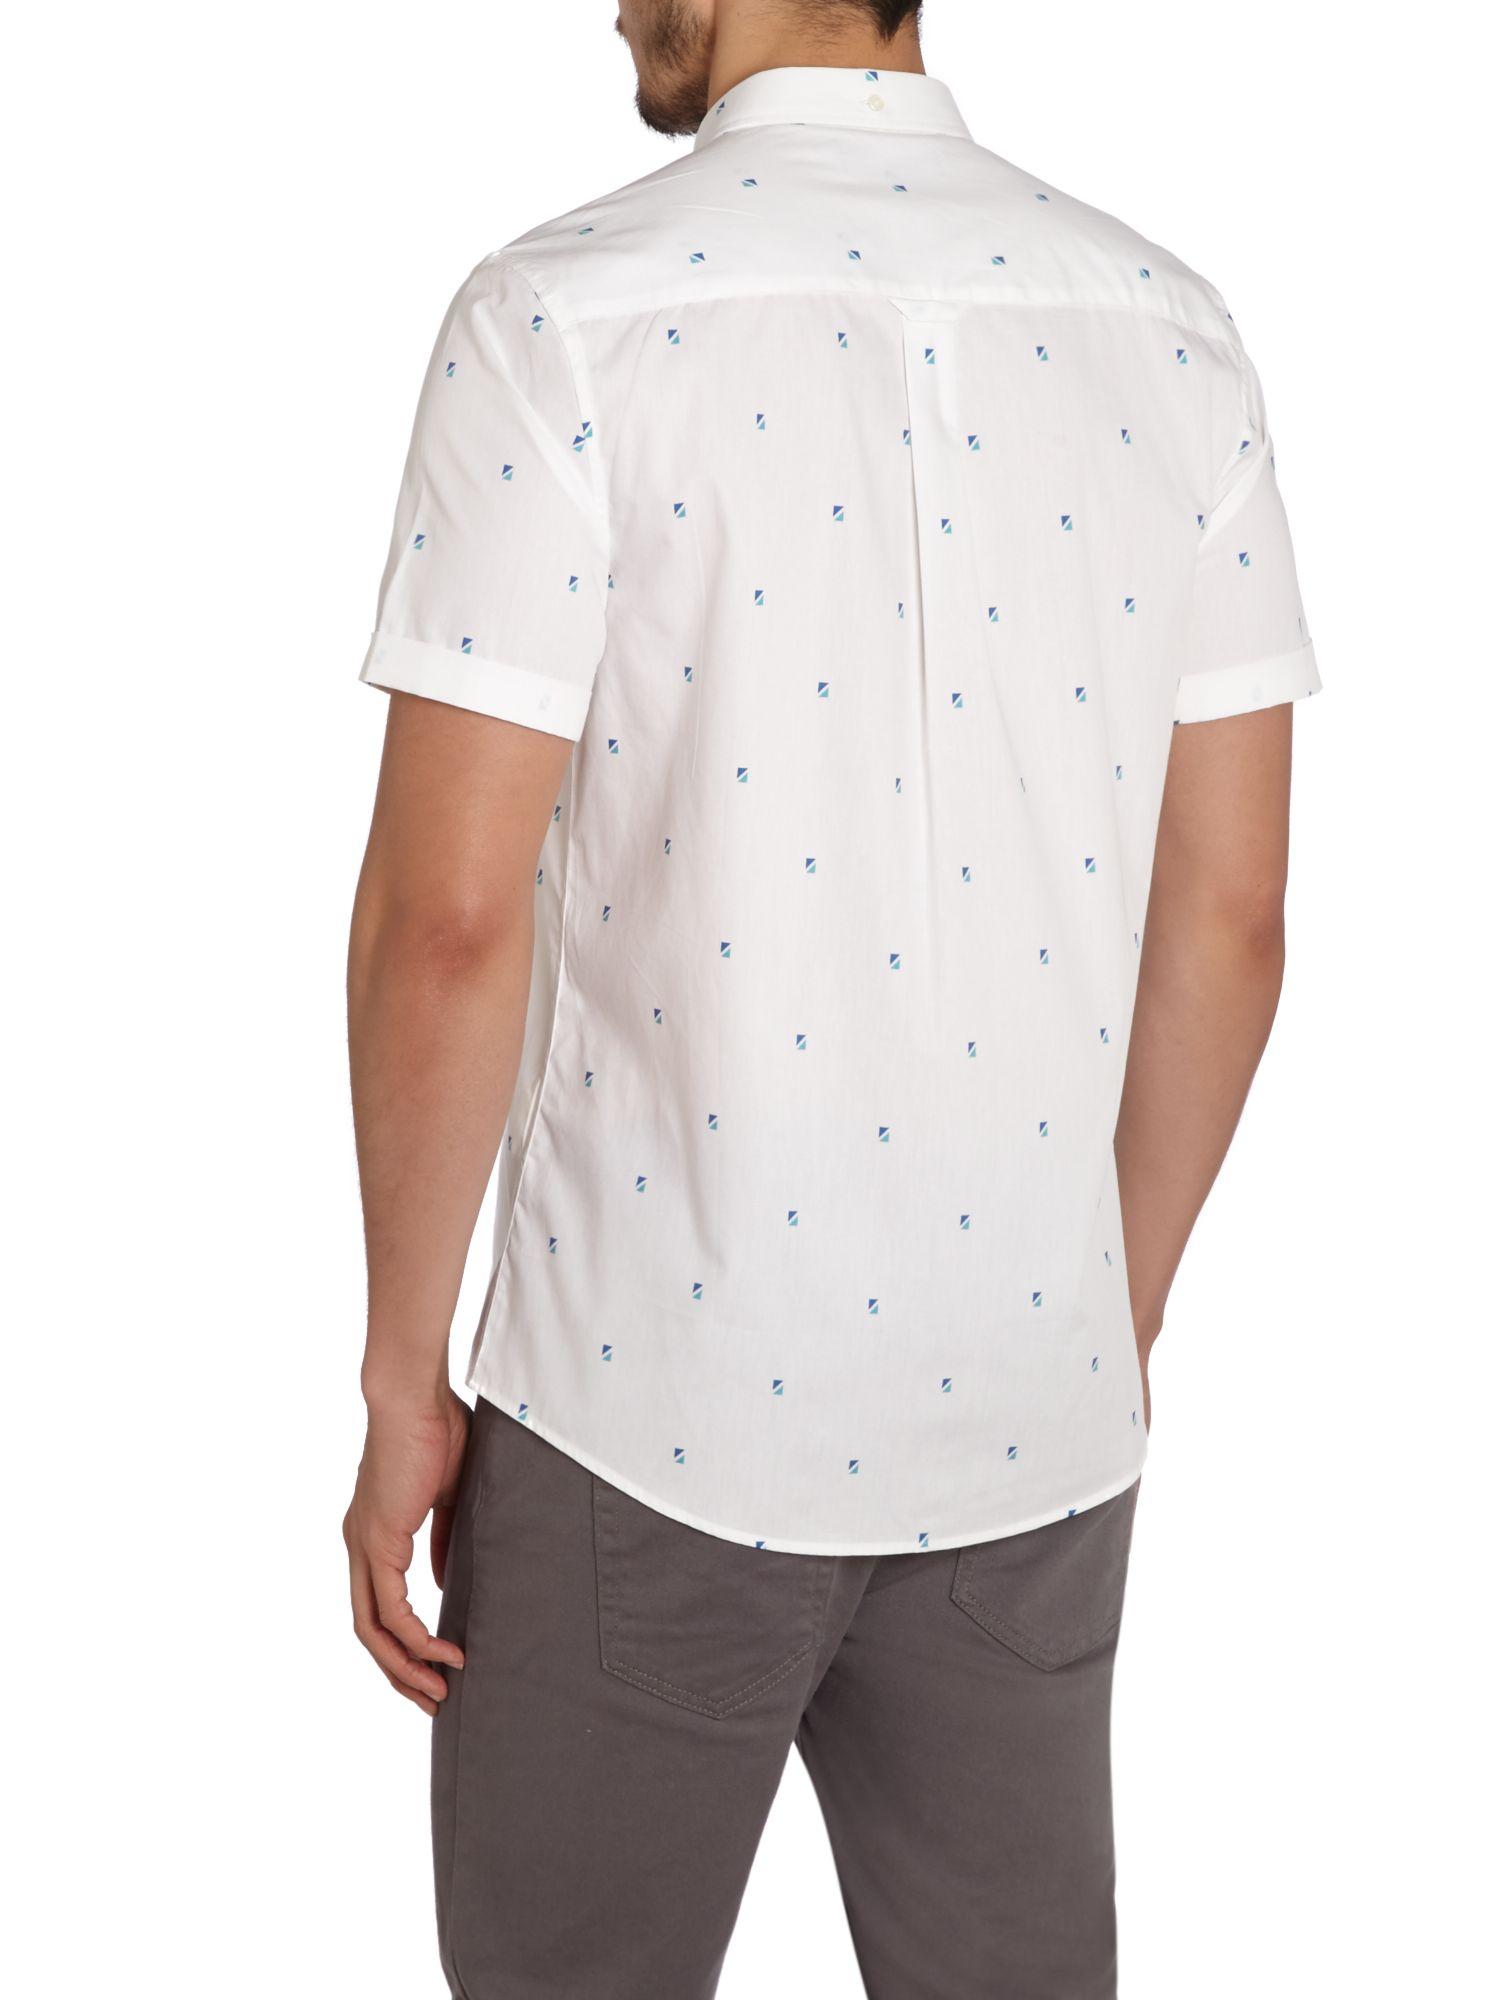 Lyle Scott Polka Dot Classic Fit Short Sleeve Shirt In